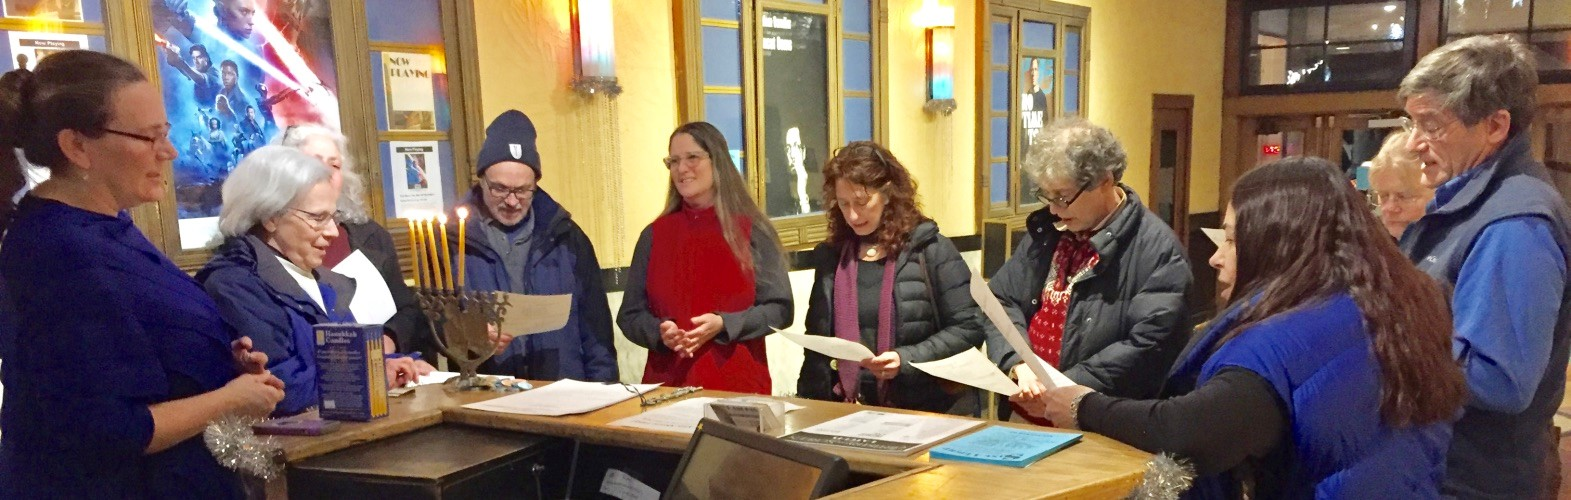 L to R-Rabbi, Ellen, Andi Waisman,  Ami Maglin/guest, Tamara Stenn, Jesse Lepkoff, Susan Auslander and guests. Photo Credit: Stephan Brandstatter